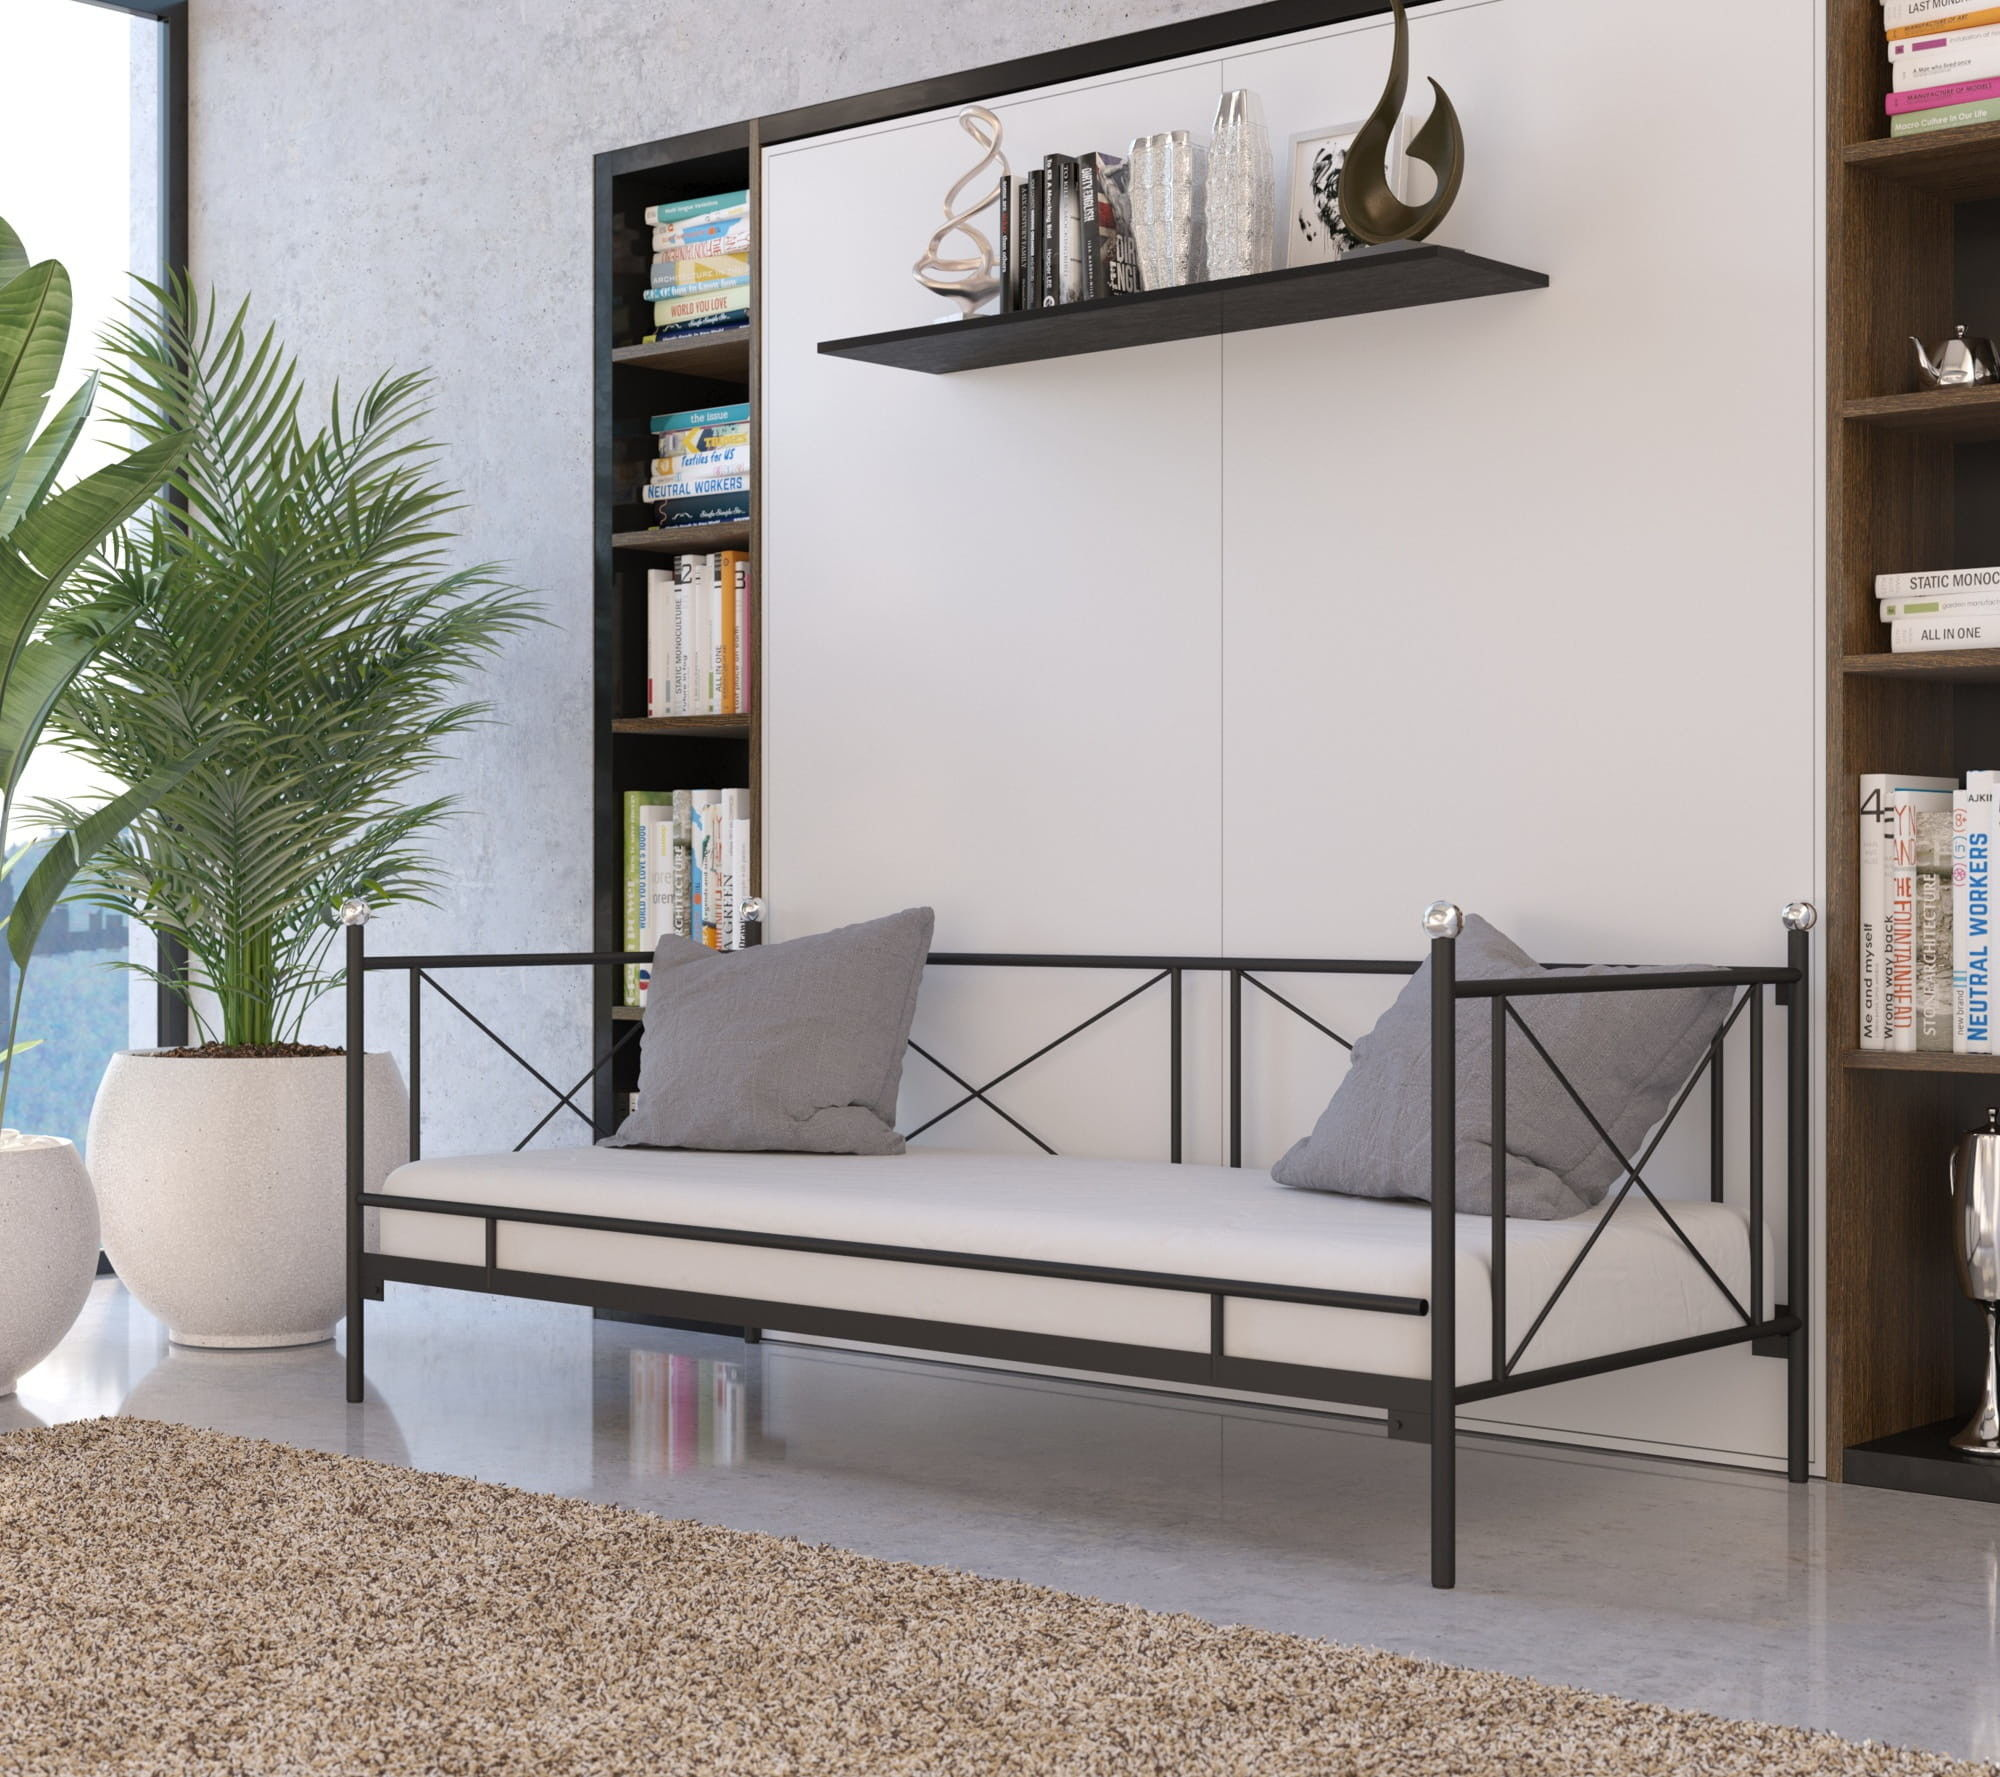 Sofa ogrodowa Lak System wzór 22